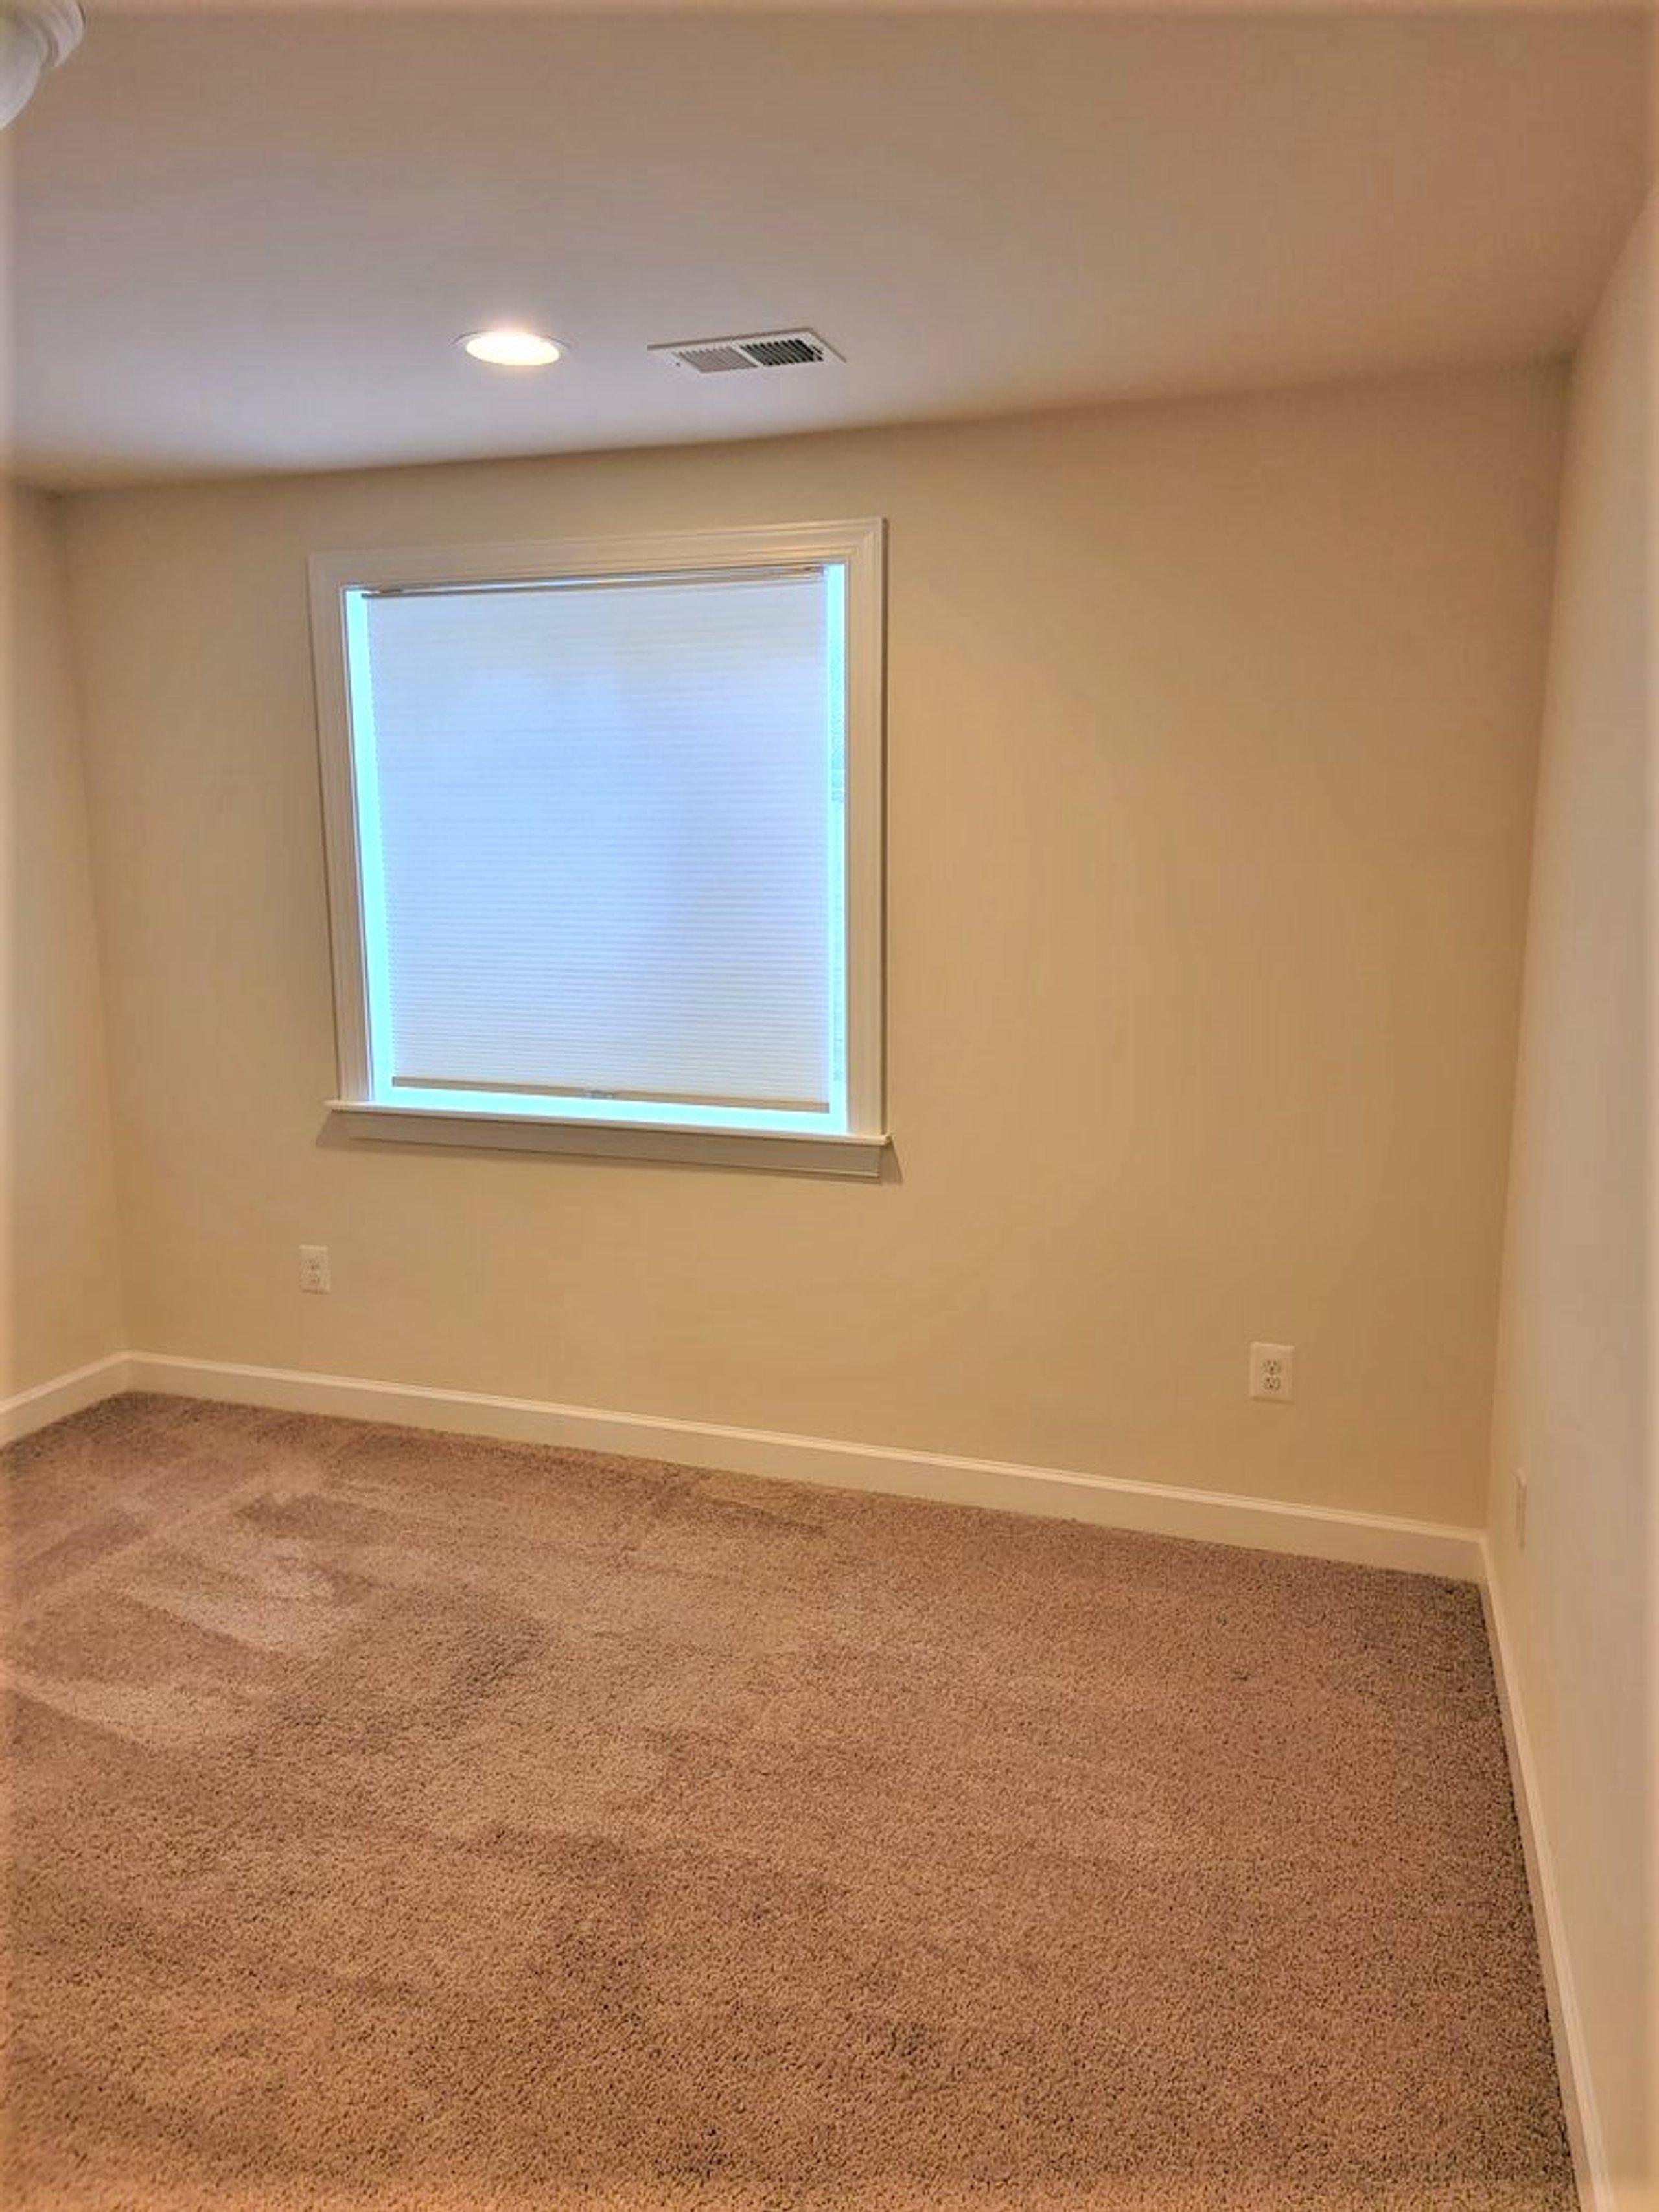 12x12 Bedroom self storage unit